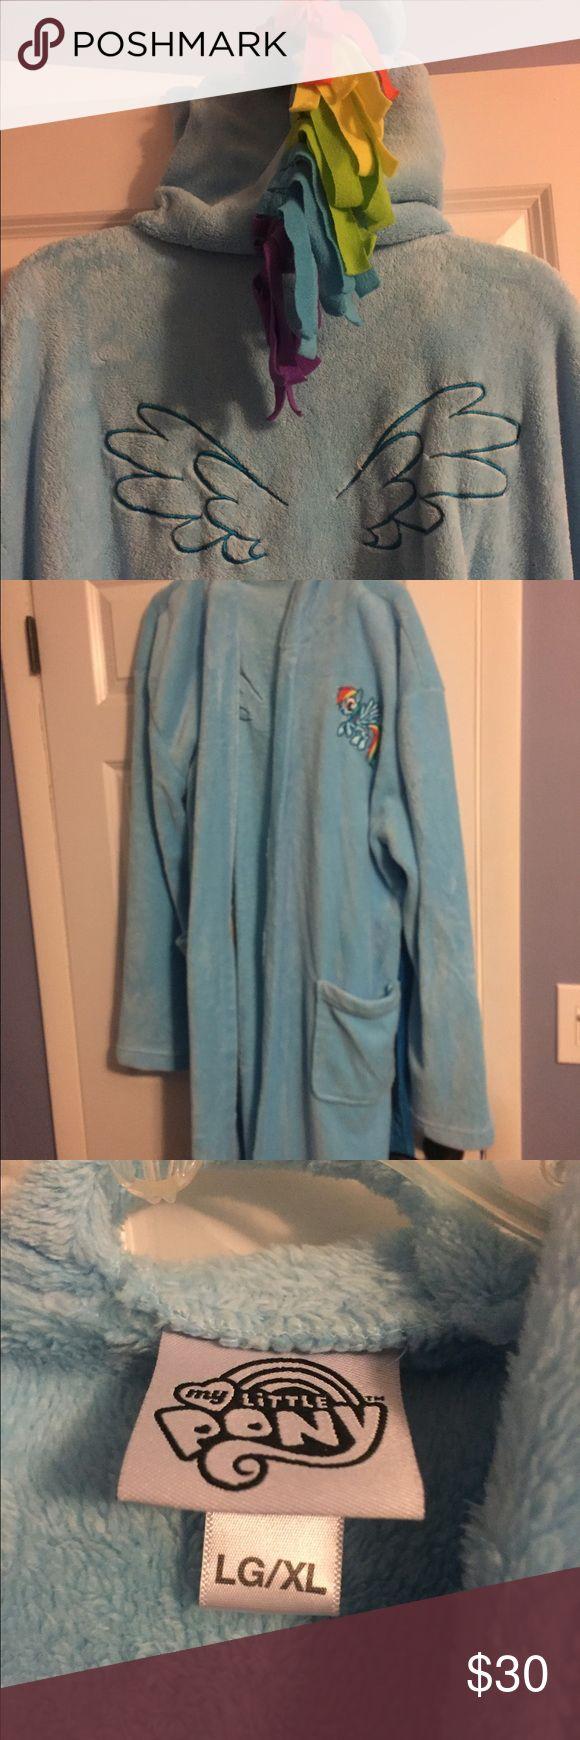 Hot topic my little pony bath robe Gently used, smoke free home, super fun bathrobe !!! Long XL blue bathrobe. The hood is my little pony!! :) Hot Topic Intimates & Sleepwear Robes